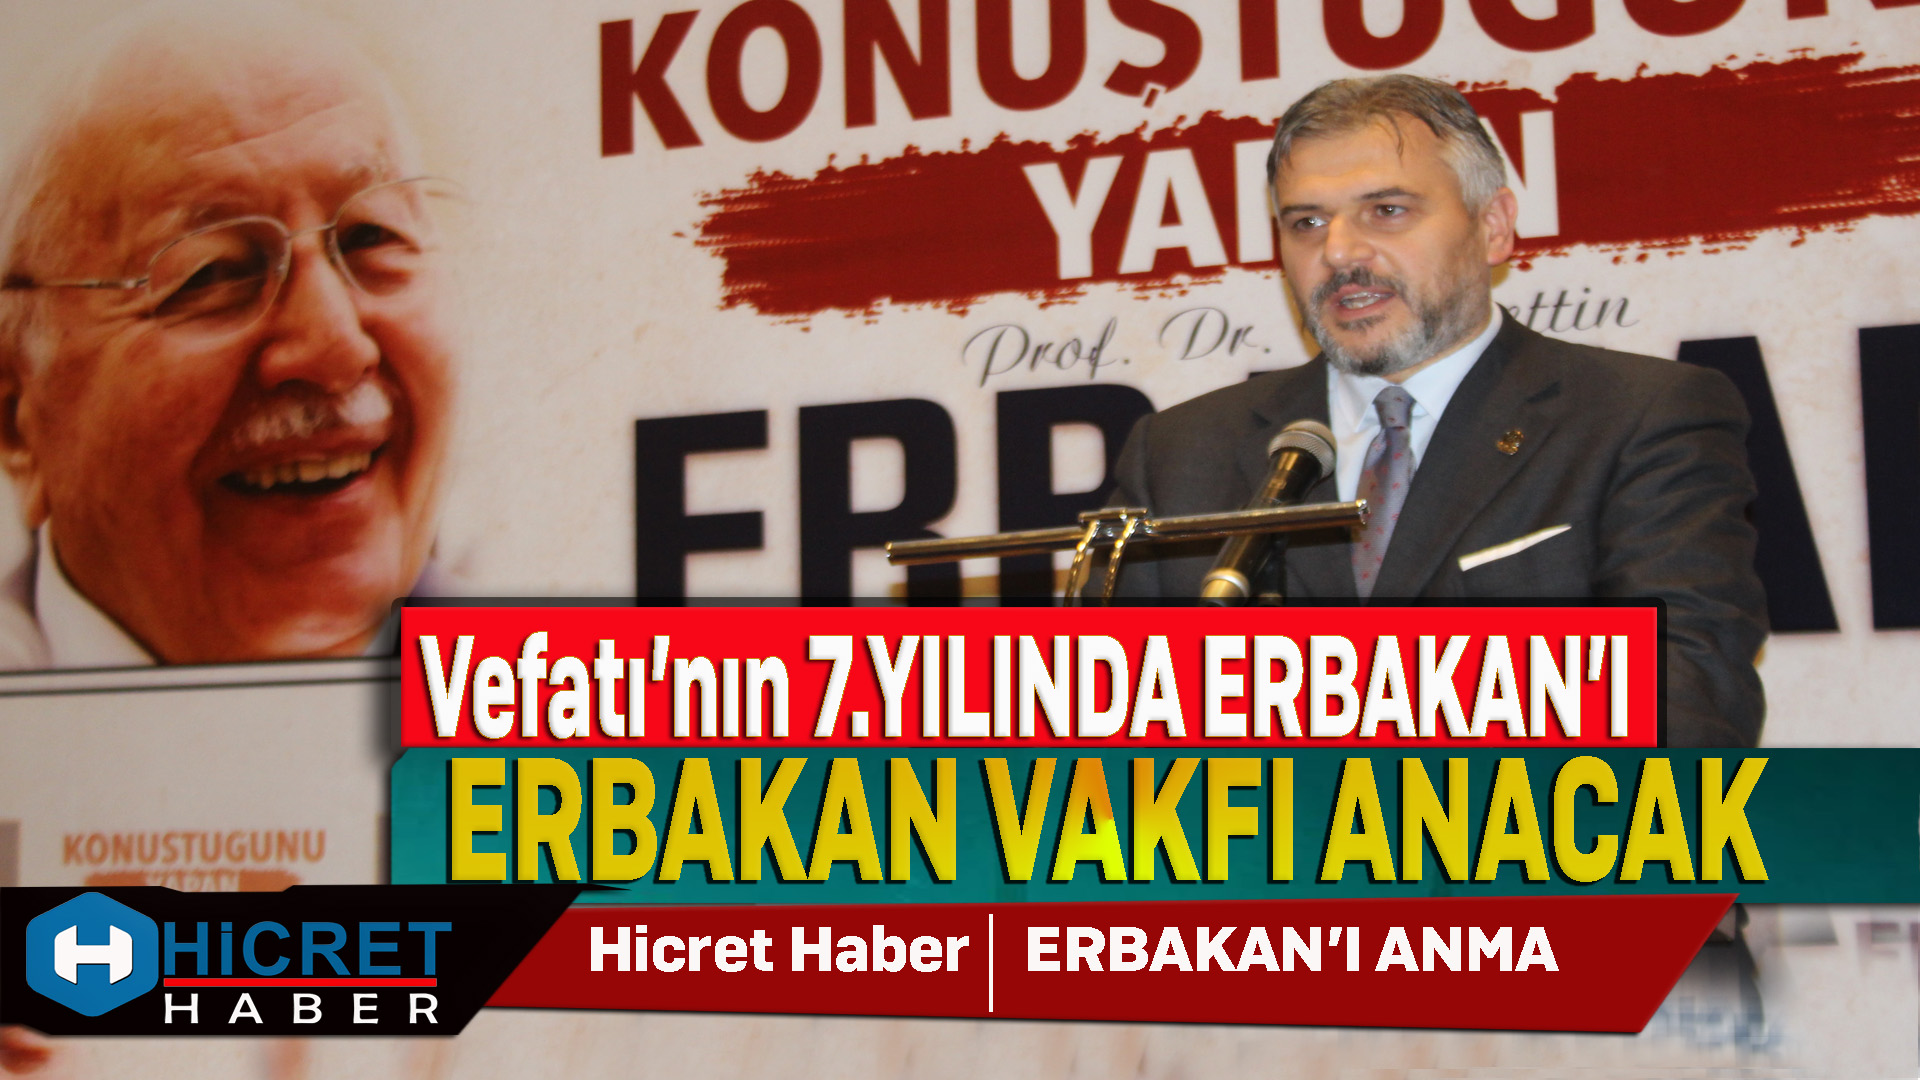 Erbakan'ı Erbakan Vakfı Anacak